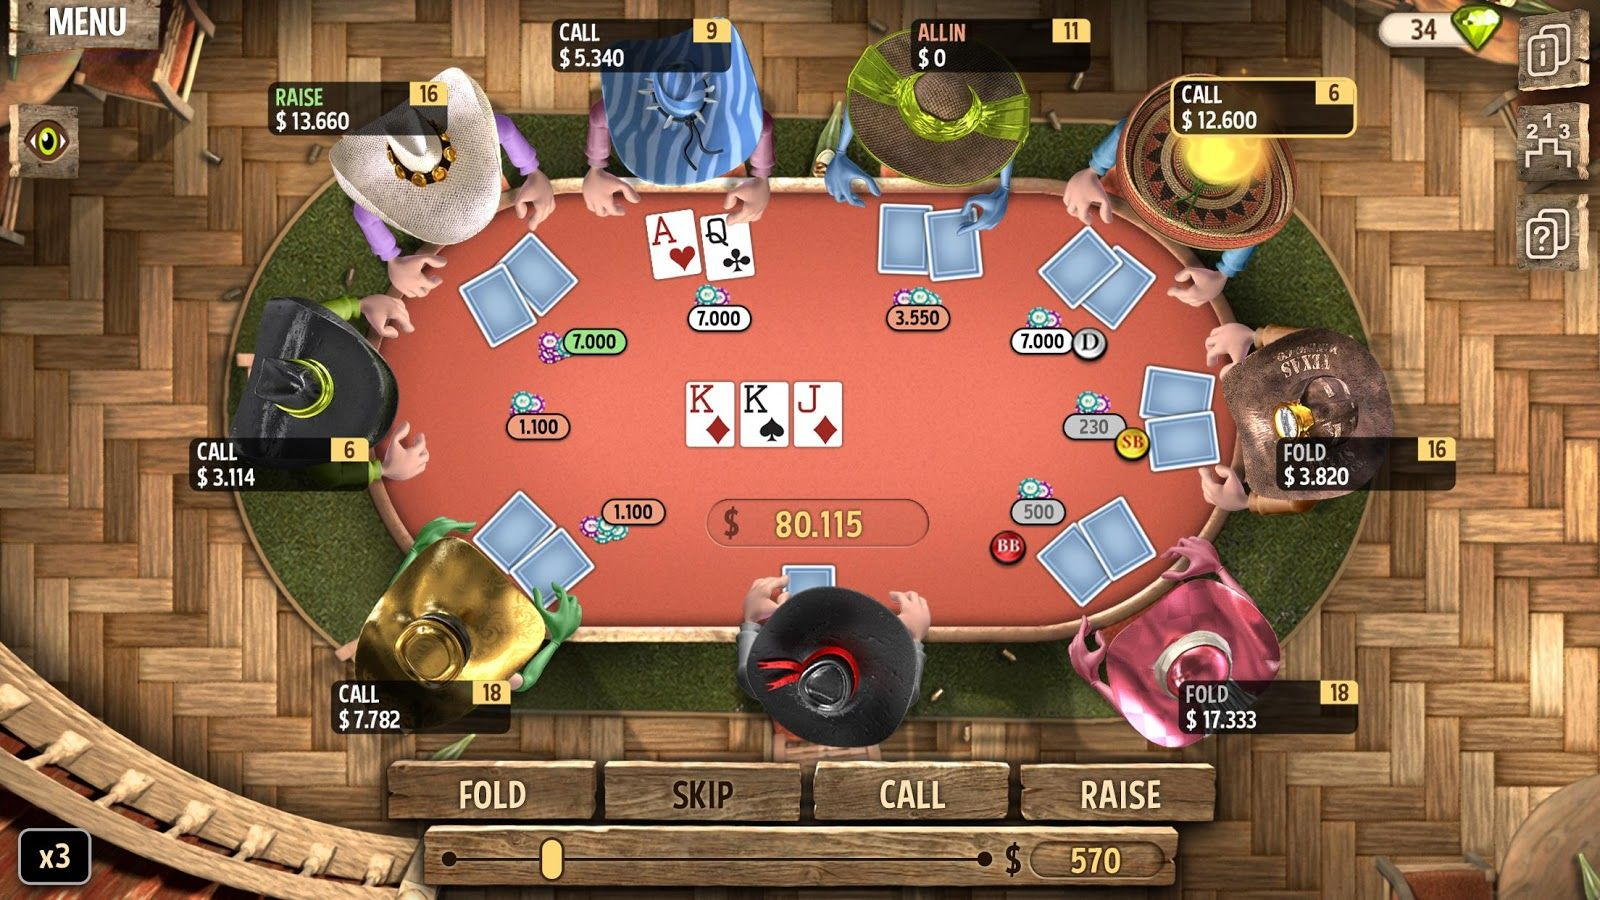 Governor of Poker 2 Hack Governor of Poker 2 Free Gems